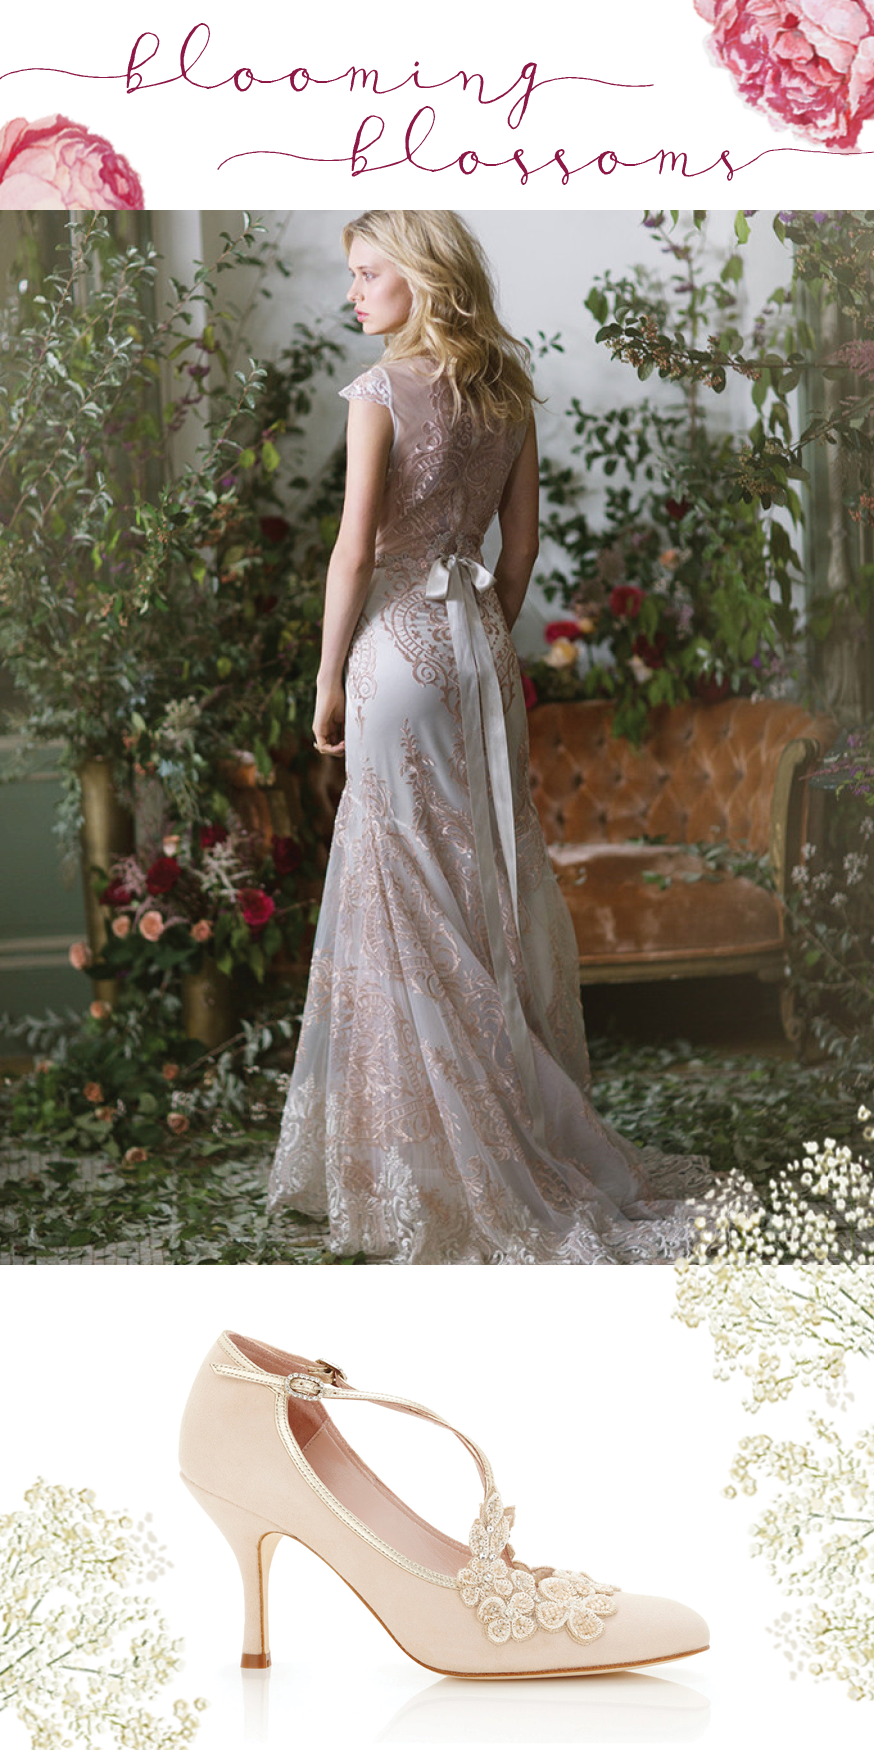 Spring 2016 | Caire Pettibone Vanderbilt | Emmy London Blossom |available at Little White Dress in Denver